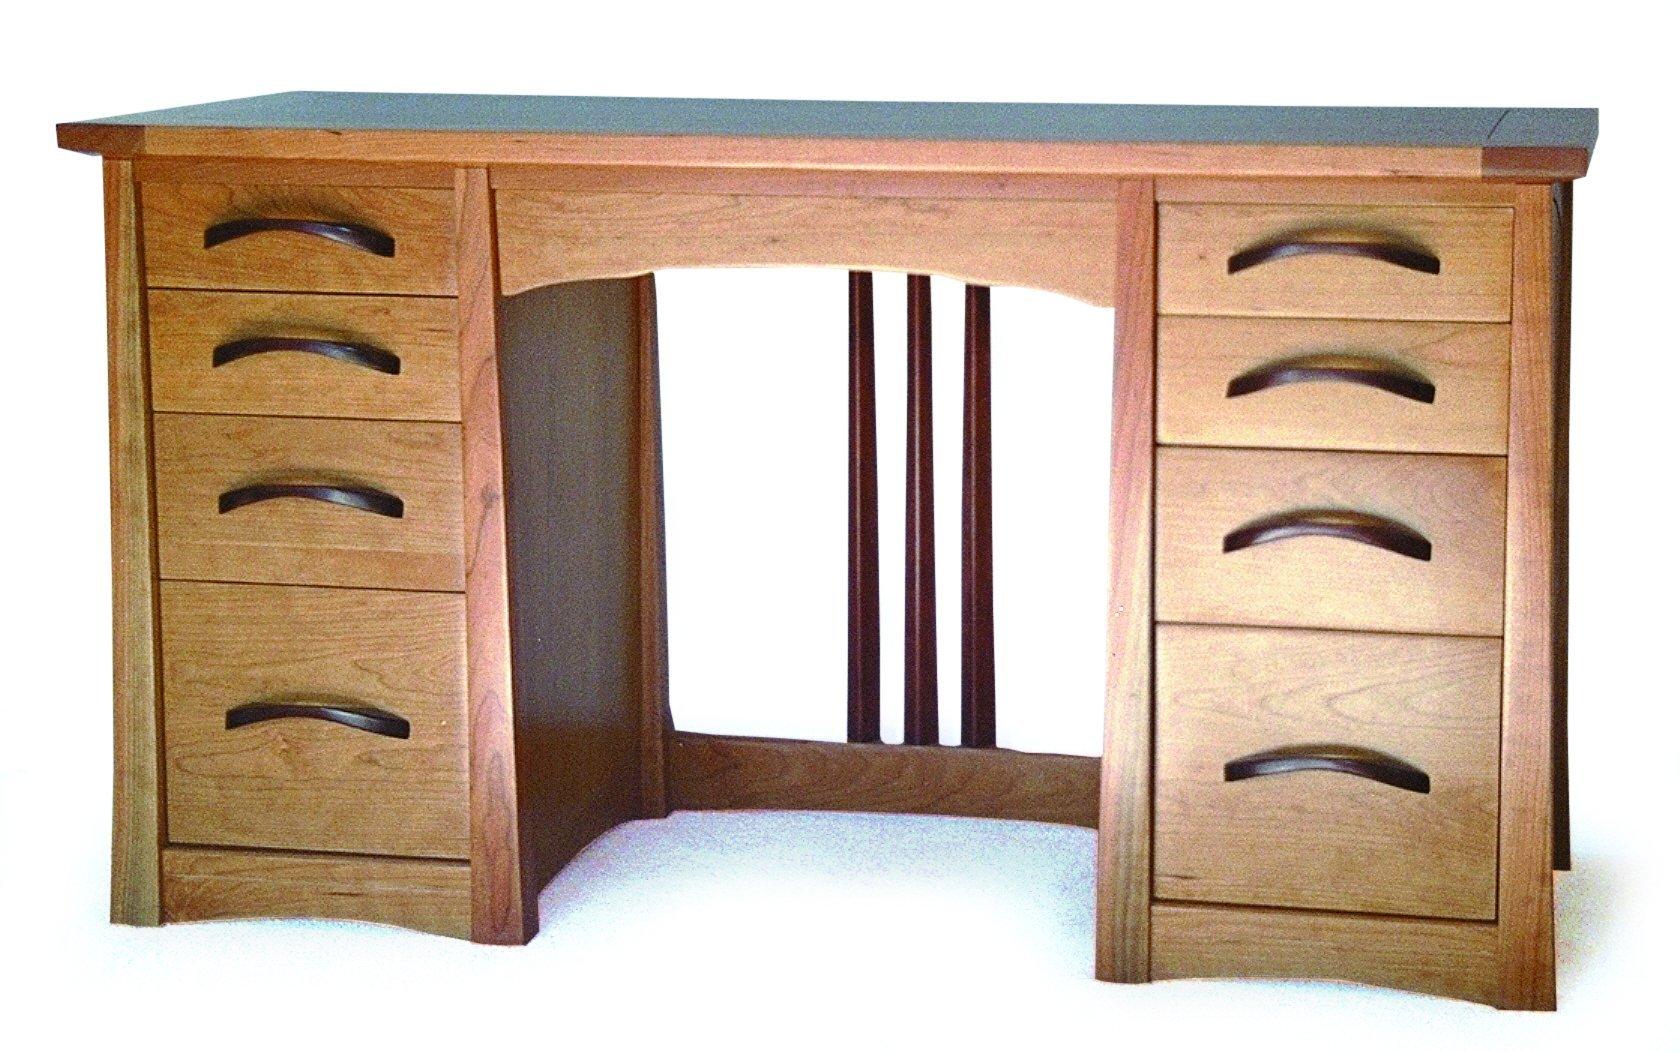 Build-Your-Own Ladies Writing Desk Plan – American Furniture Design